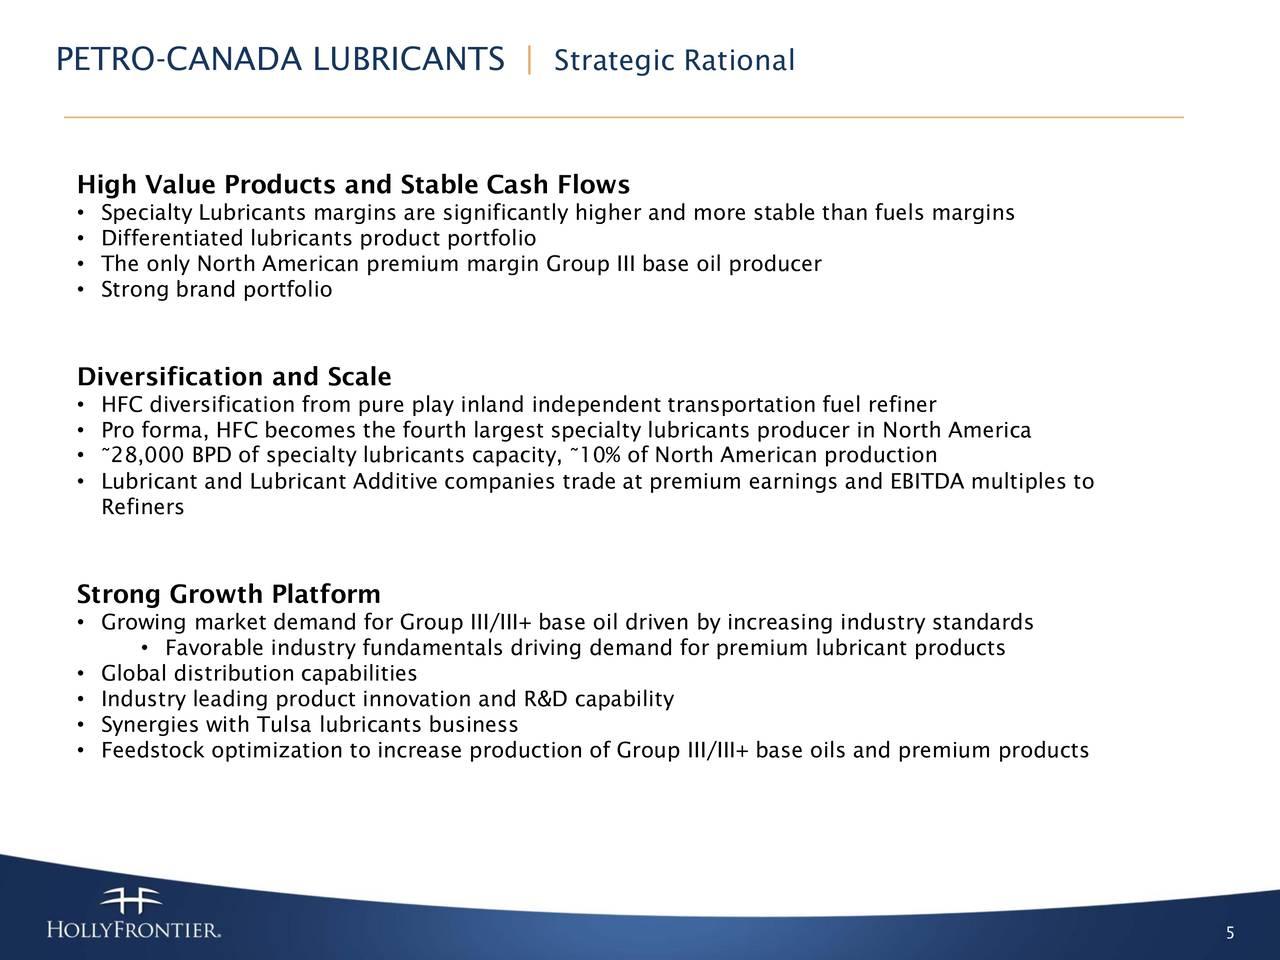 strategic plan for petro canada